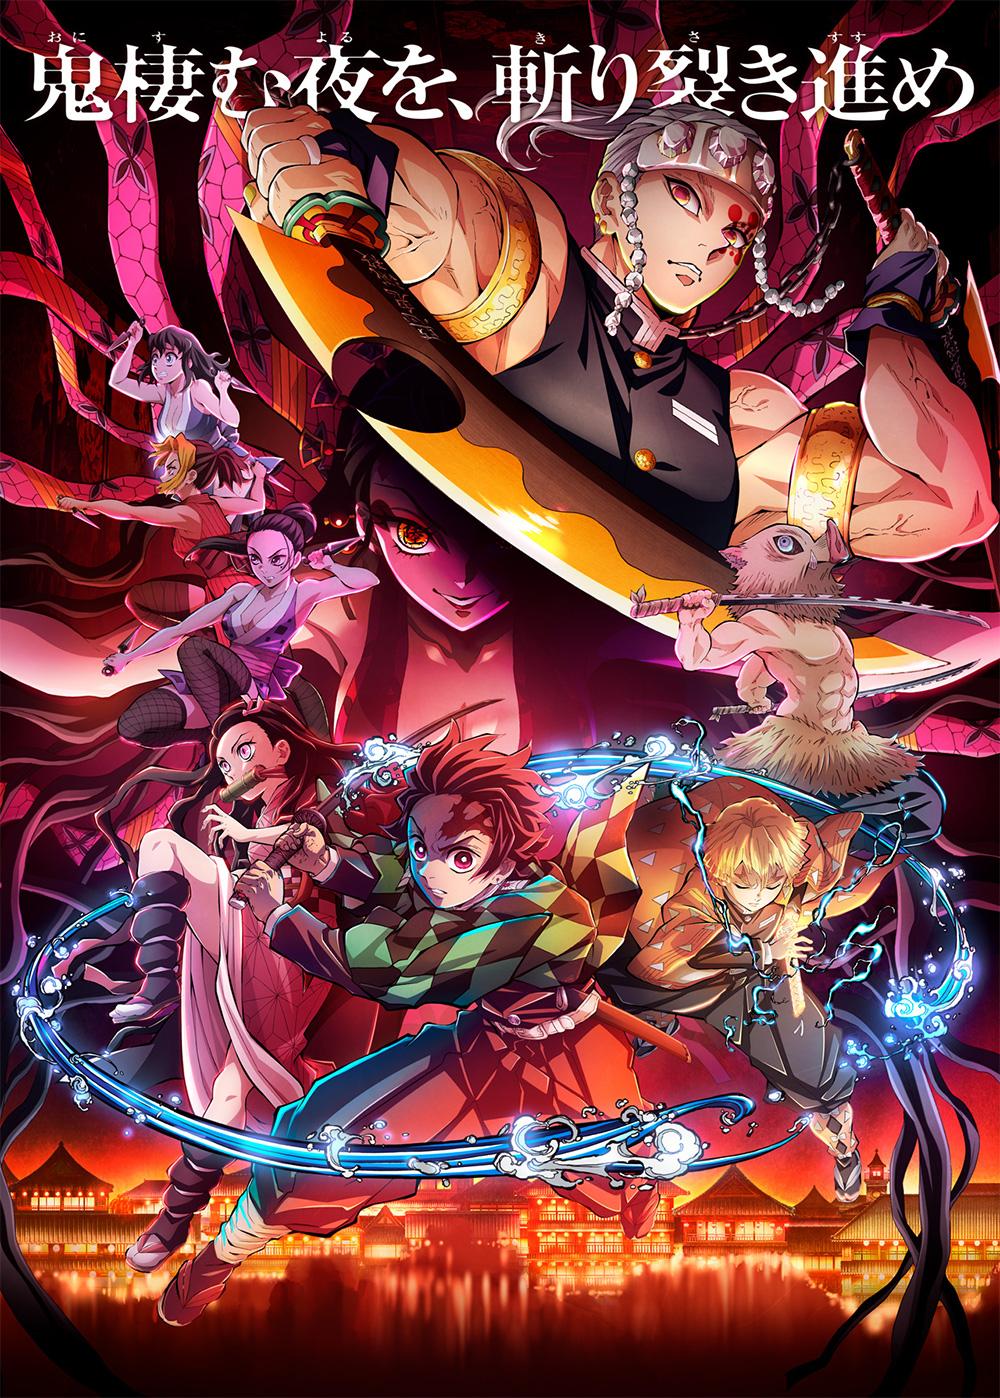 Demon-Slayer-Season-2-Anime-Visual-02